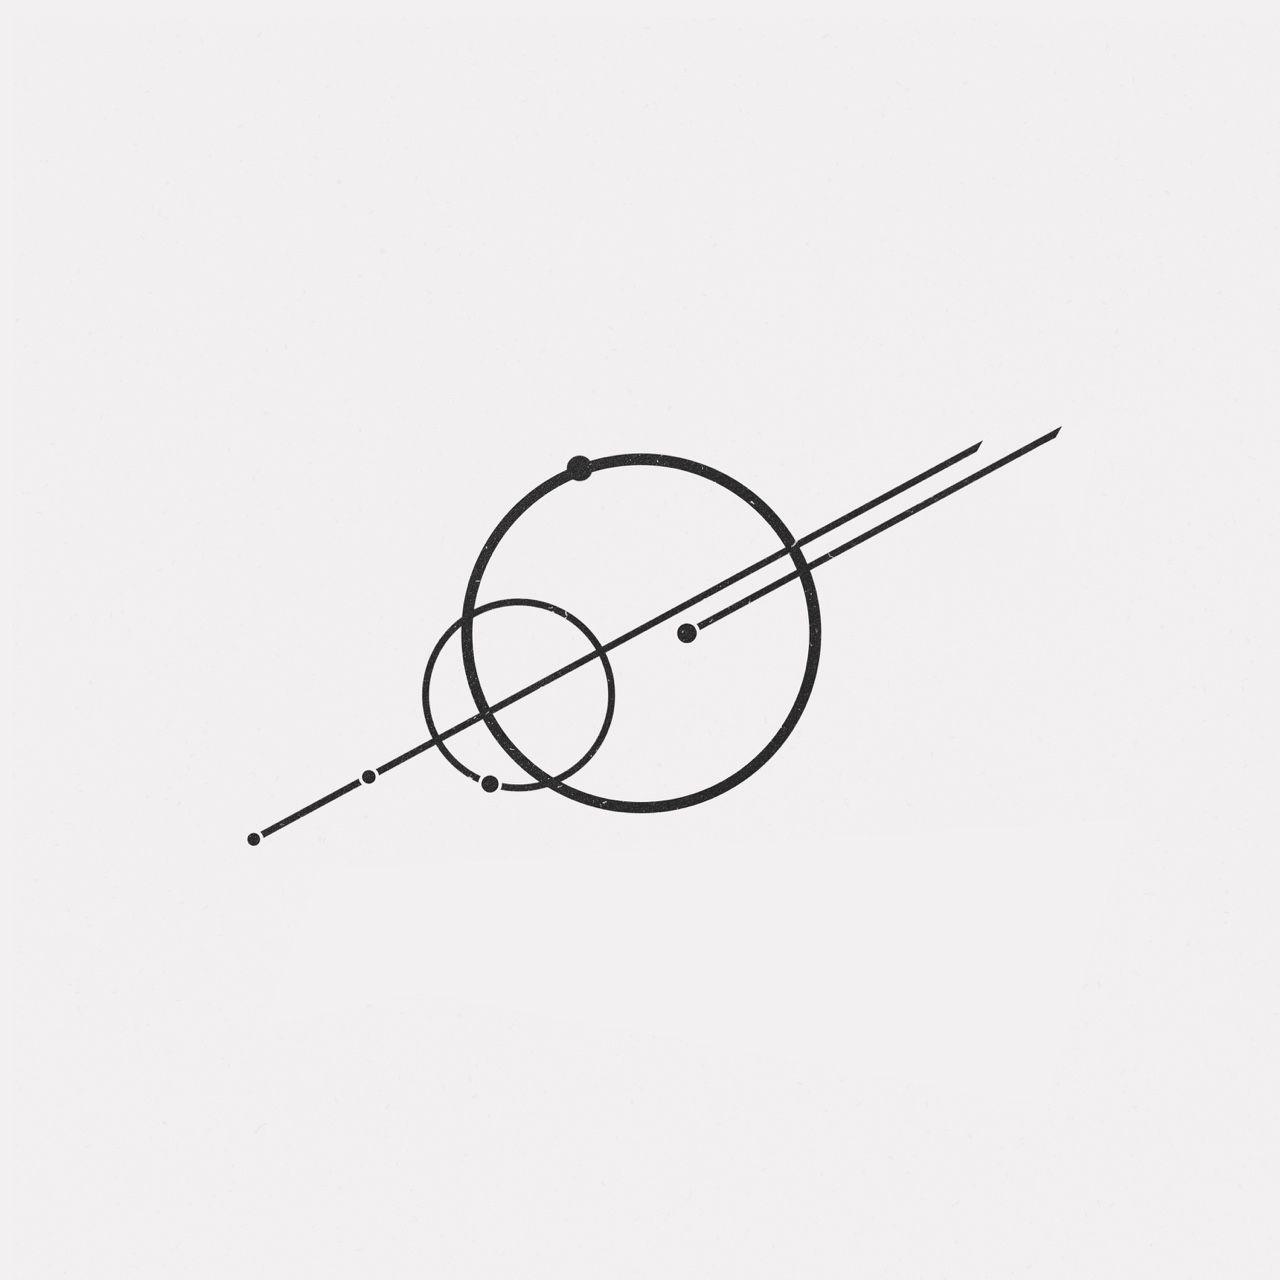 Ju16 612 A New Geometric Design Every Day Geometric Tattoo